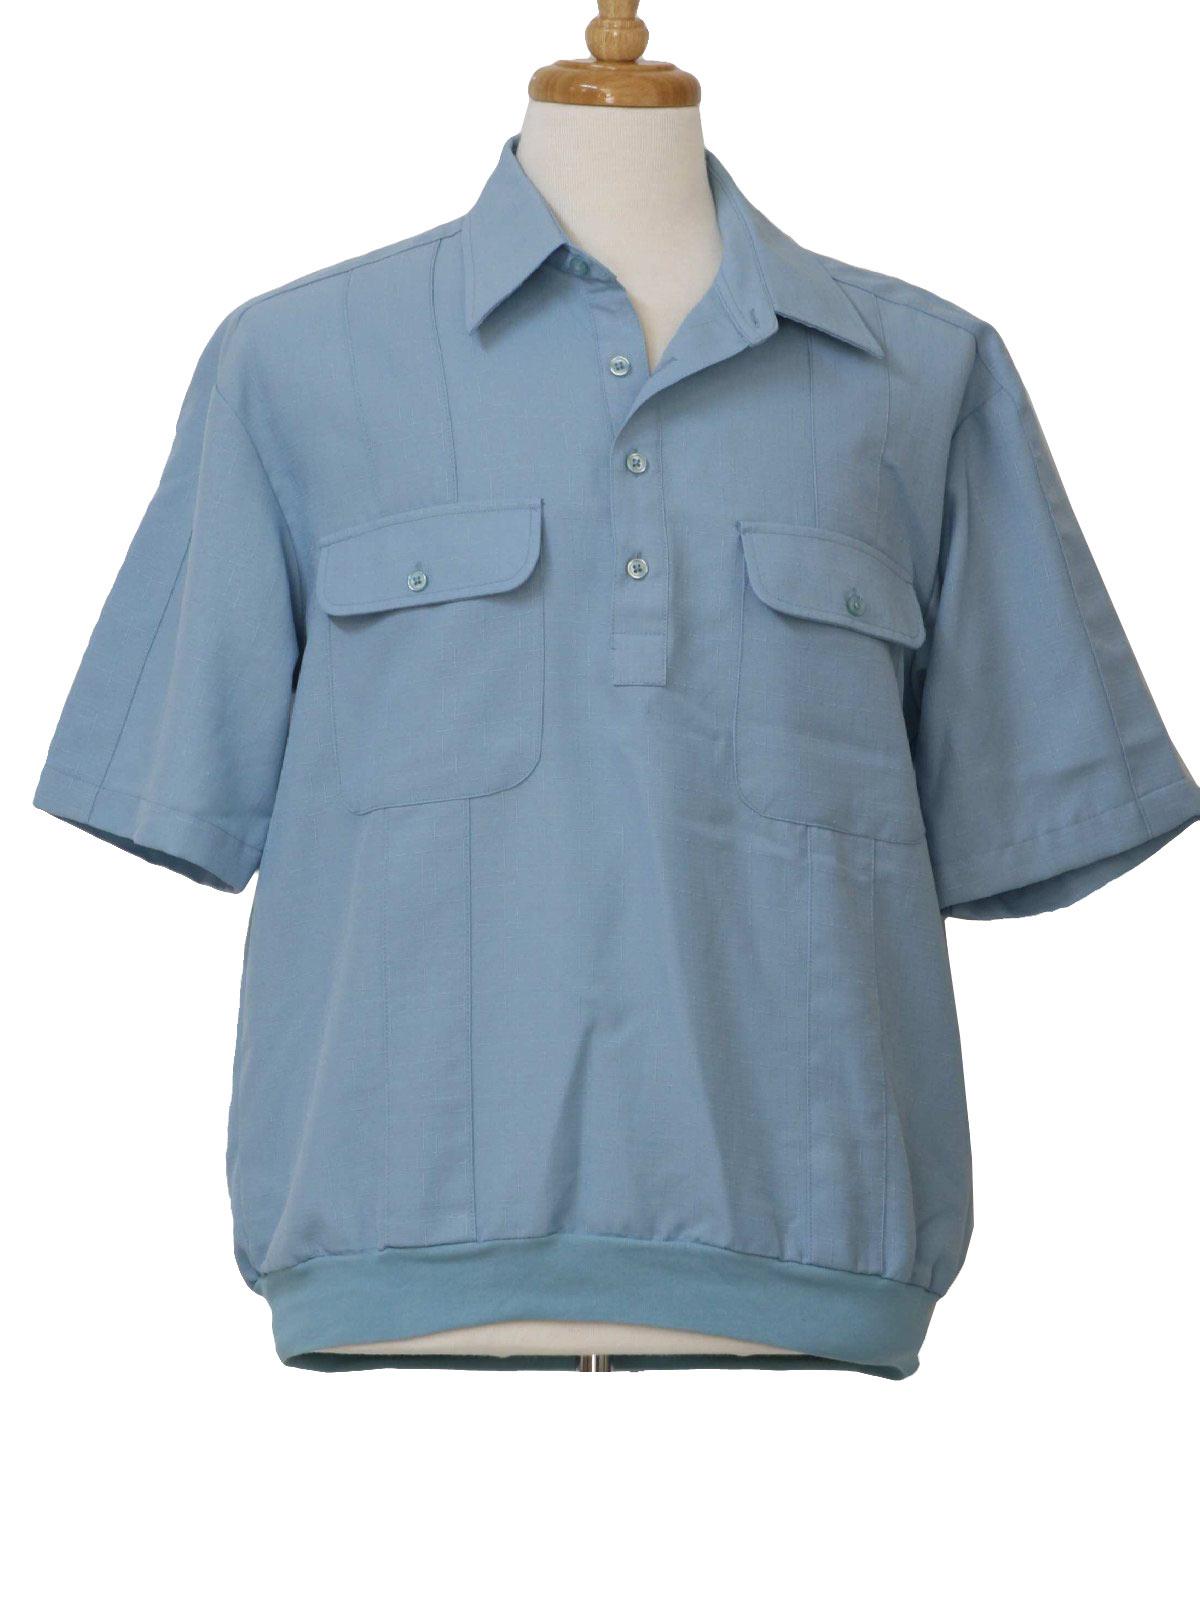 Vintage 1980 S Shirt 80s John Blair Mens Light Dusty